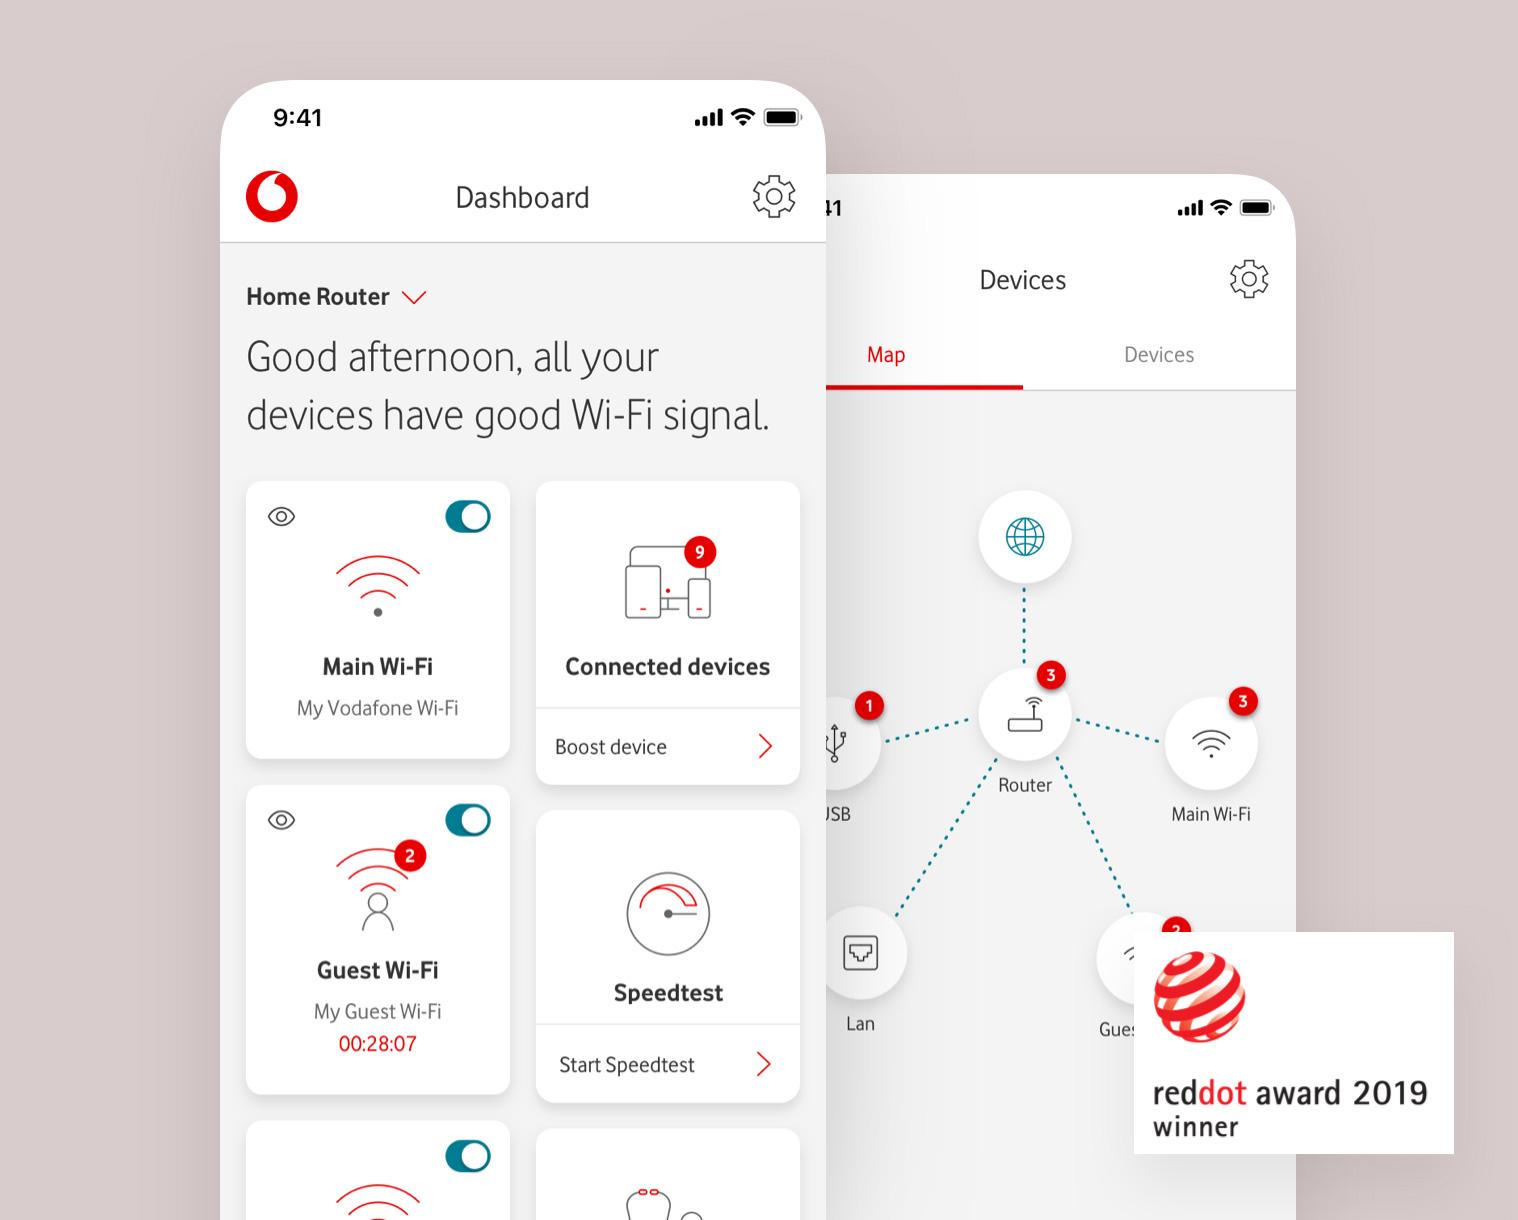 vodafone-broadband-app-teaserx@2x